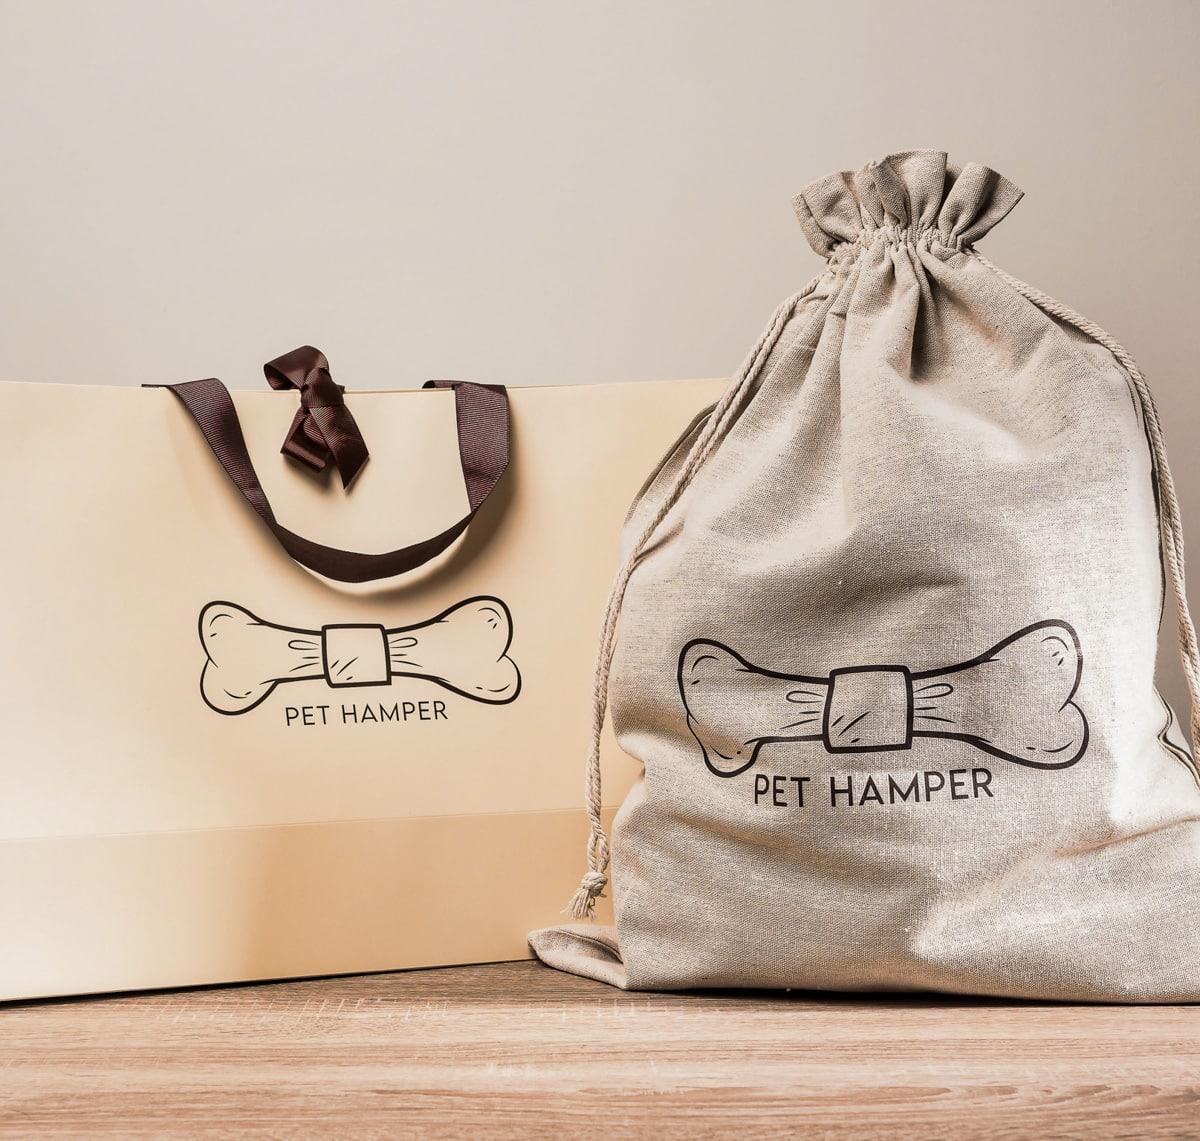 pet-hamper-gift-packaging